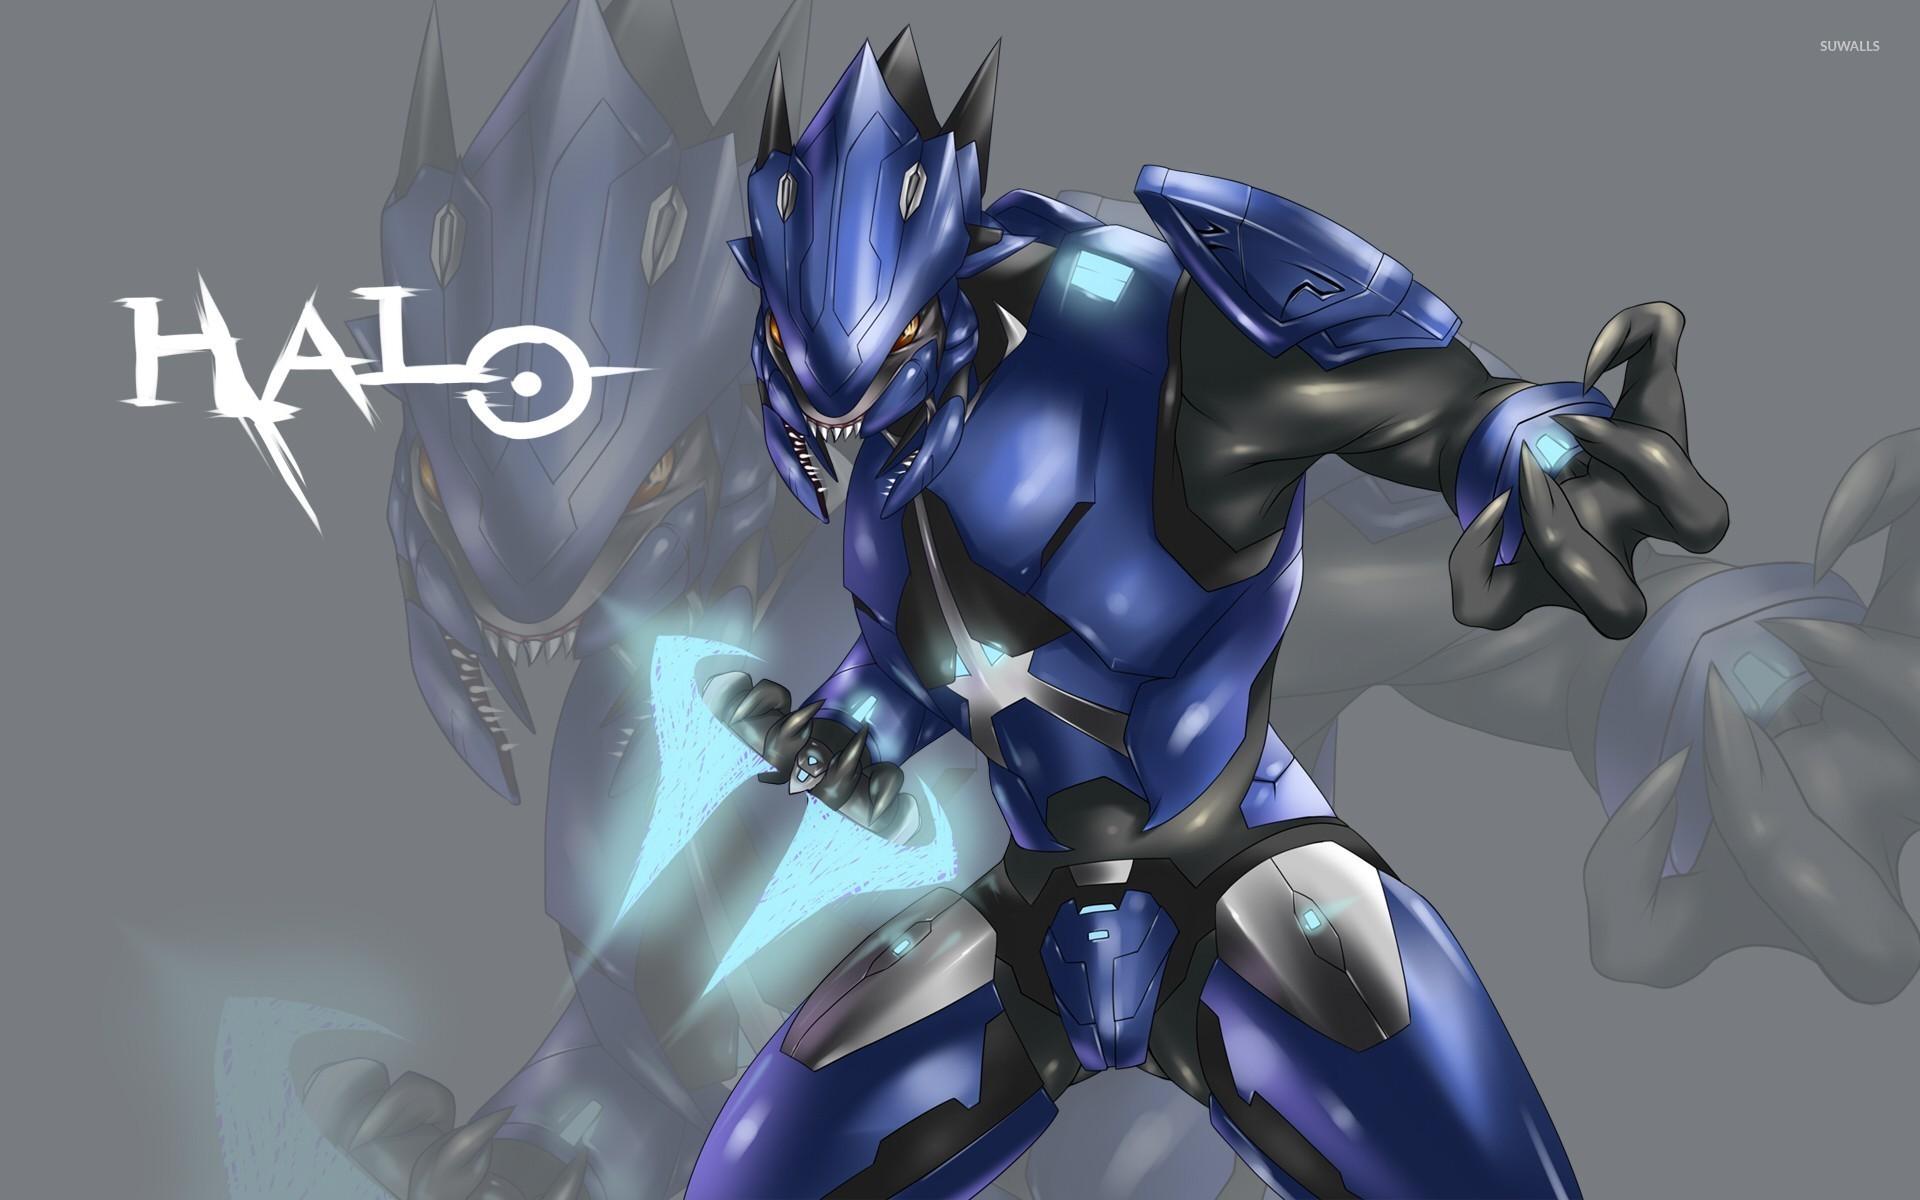 Arbiter – Halo wallpaper jpg